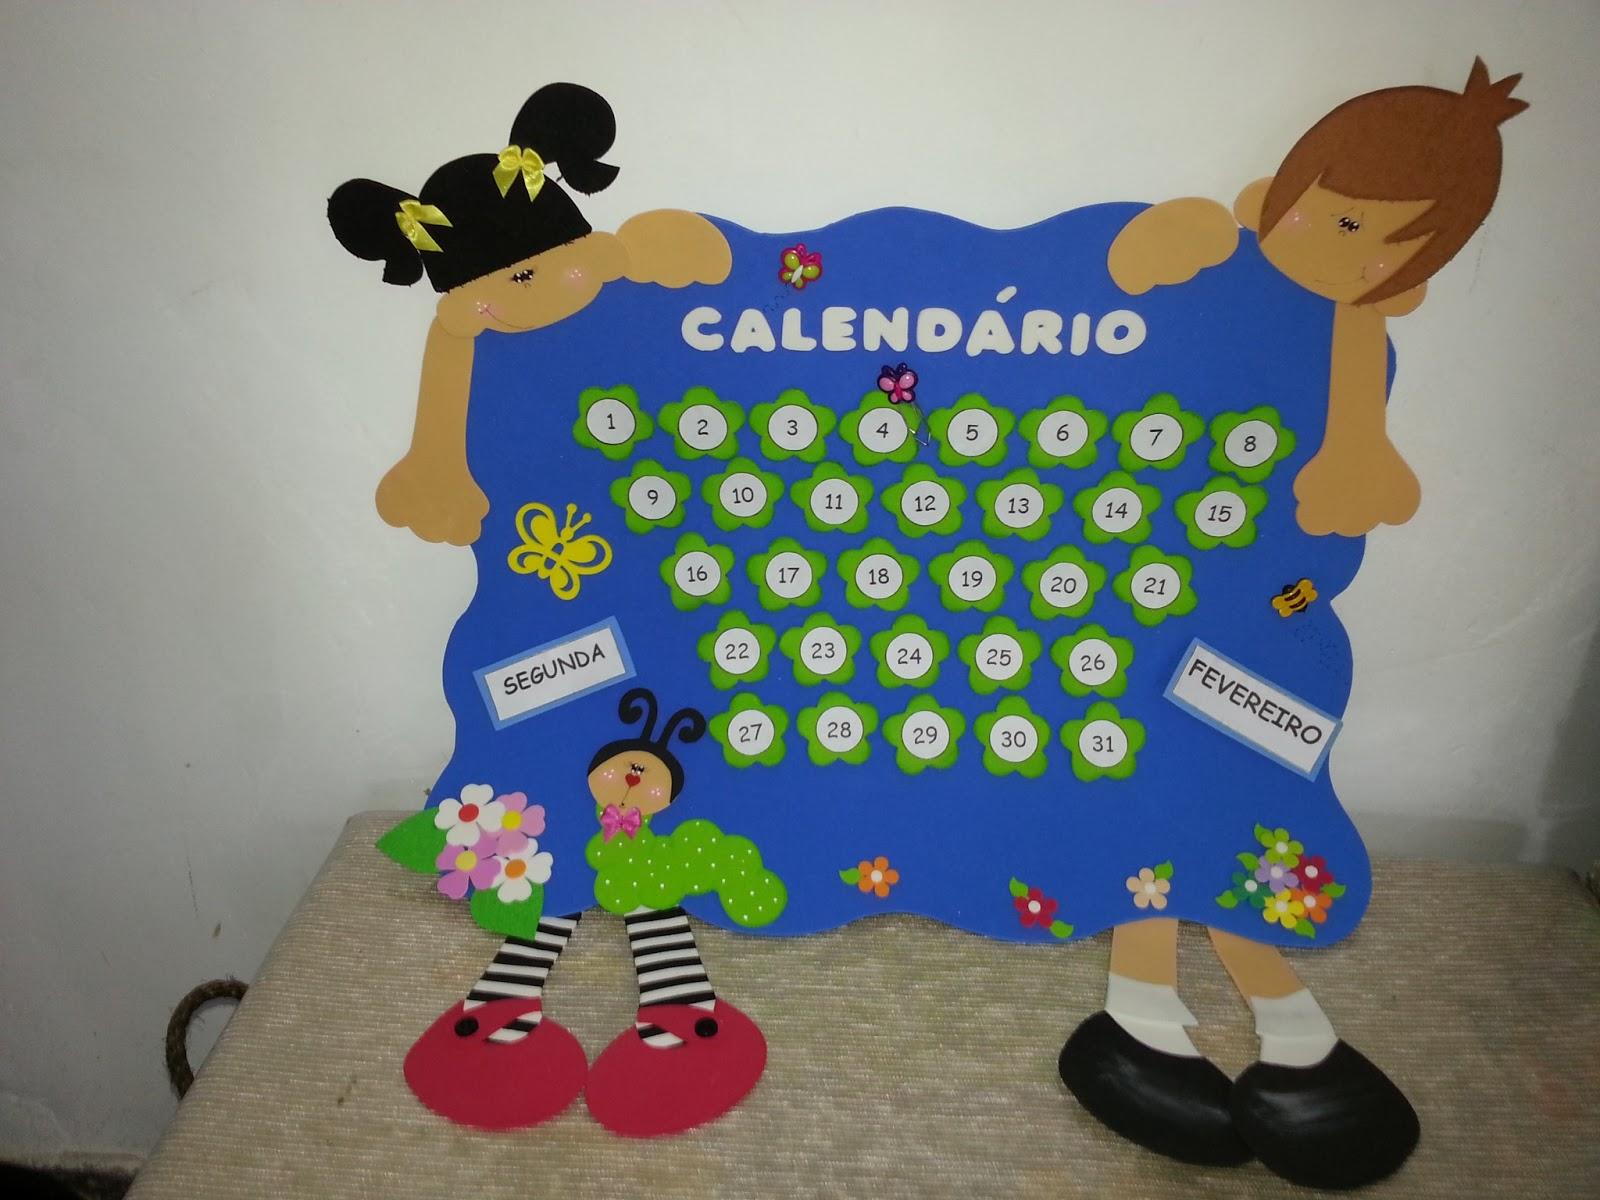 decoracao de sala aula educacao infantil:kit decoracao de sala de aula decoracao kit decoracao de